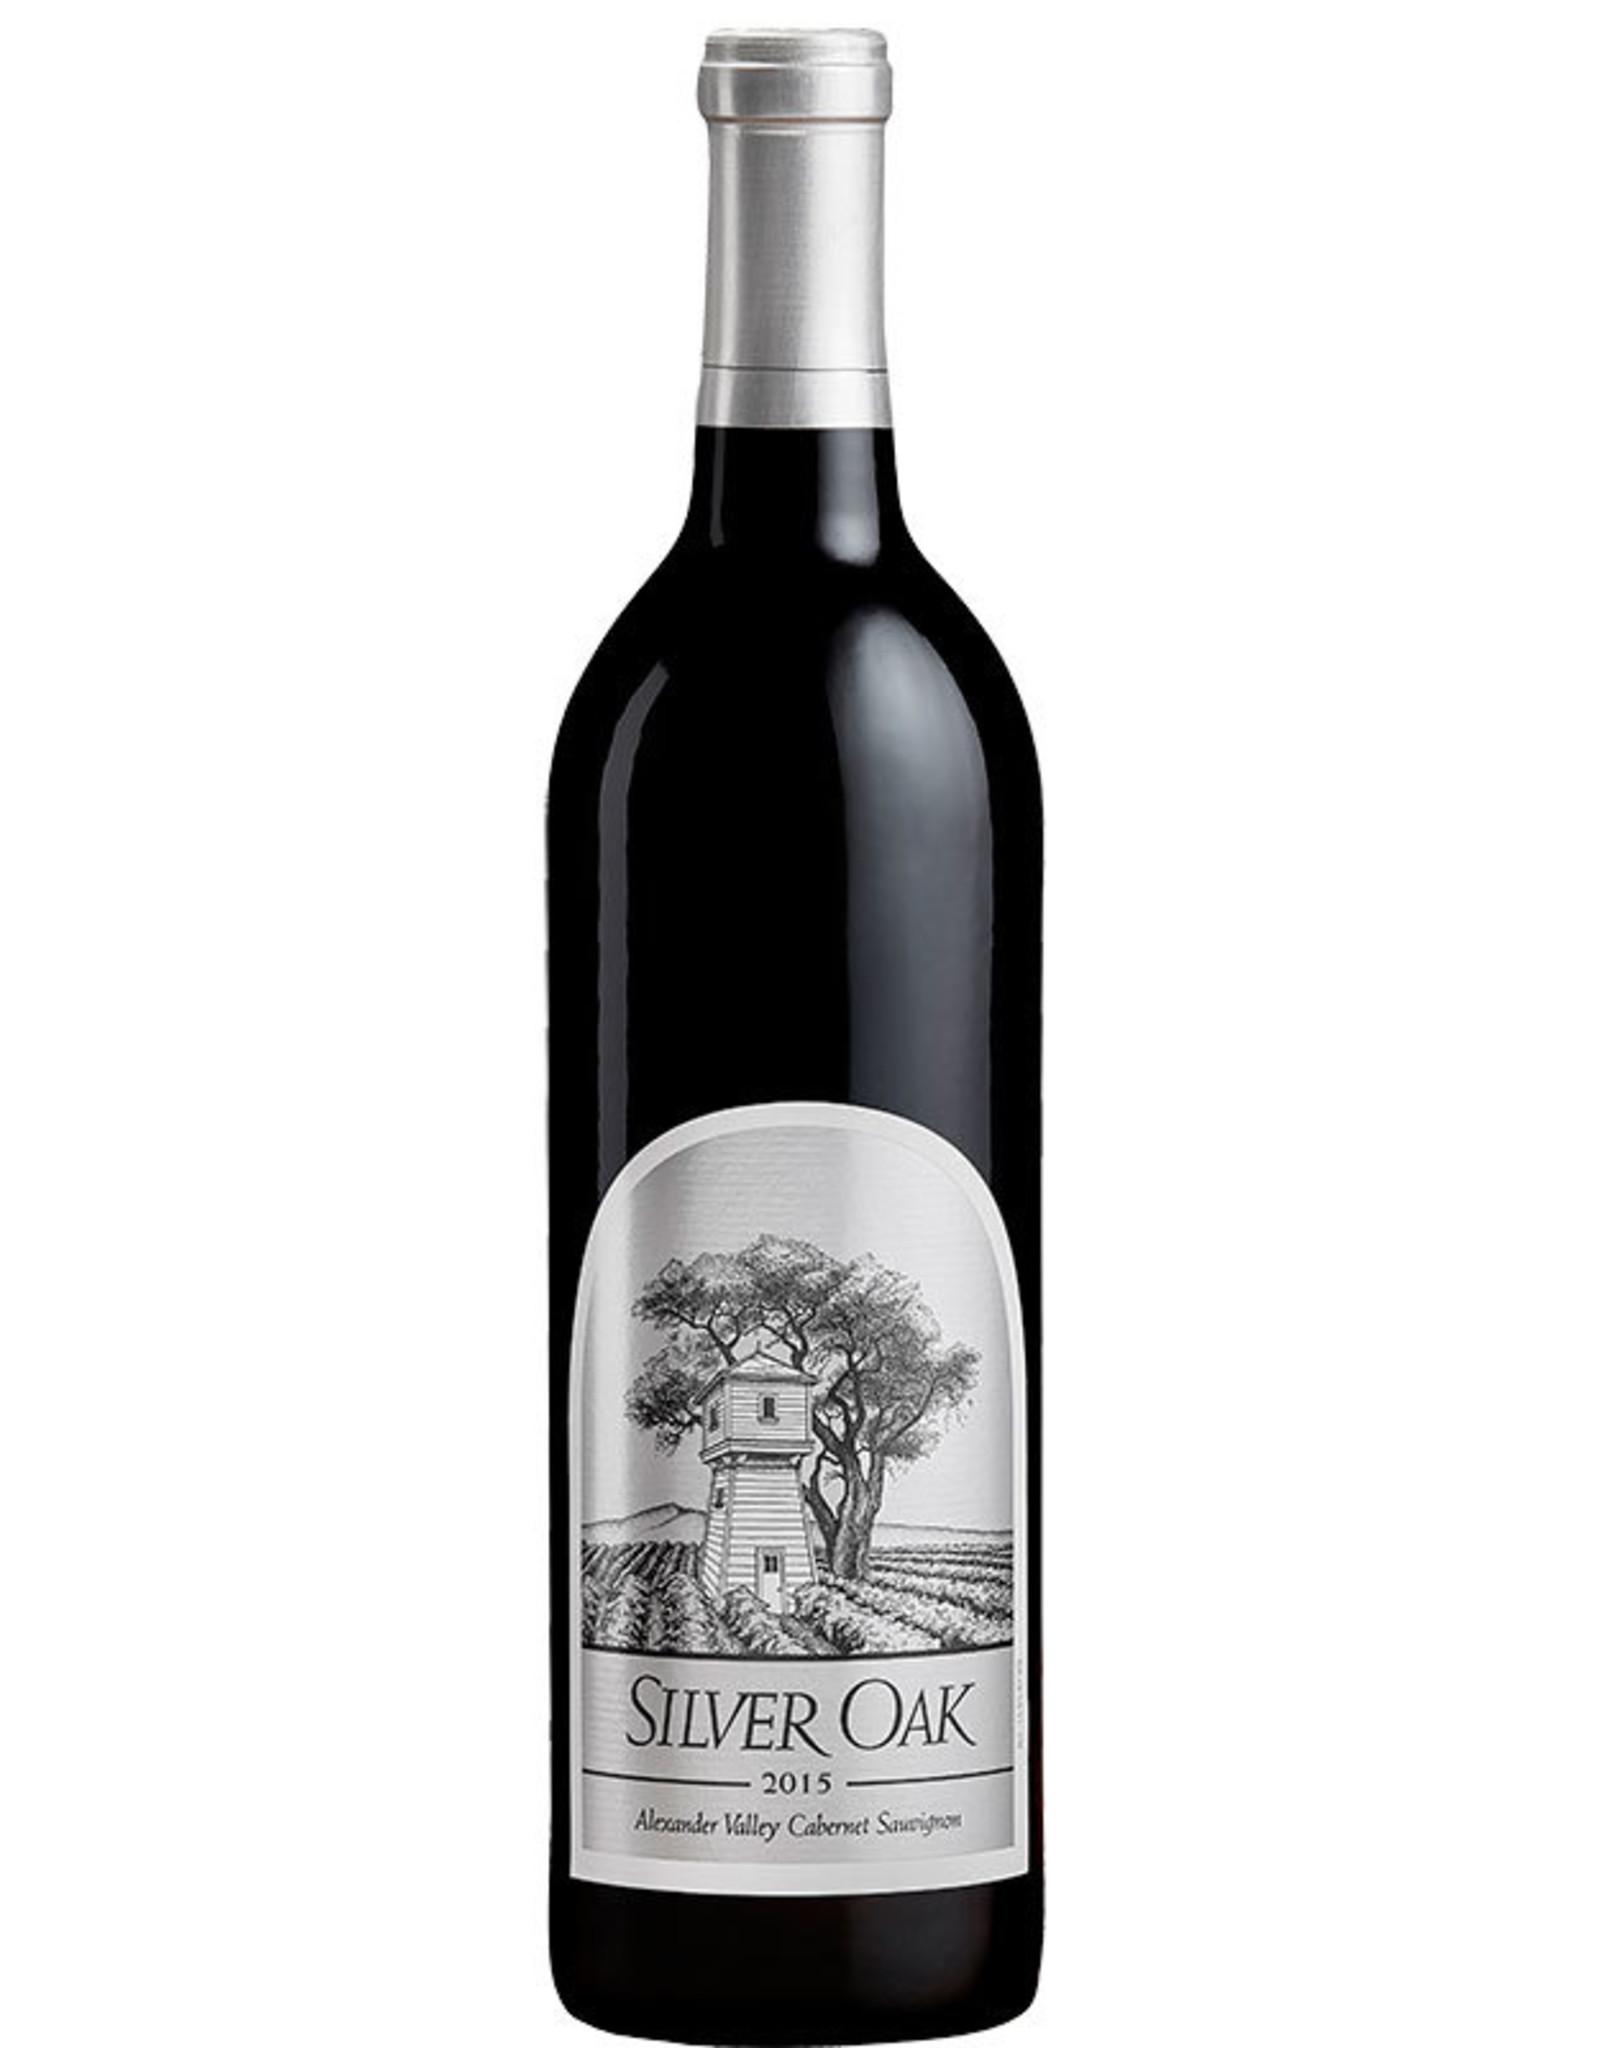 Silver Oak Alexander Valley Cabernet